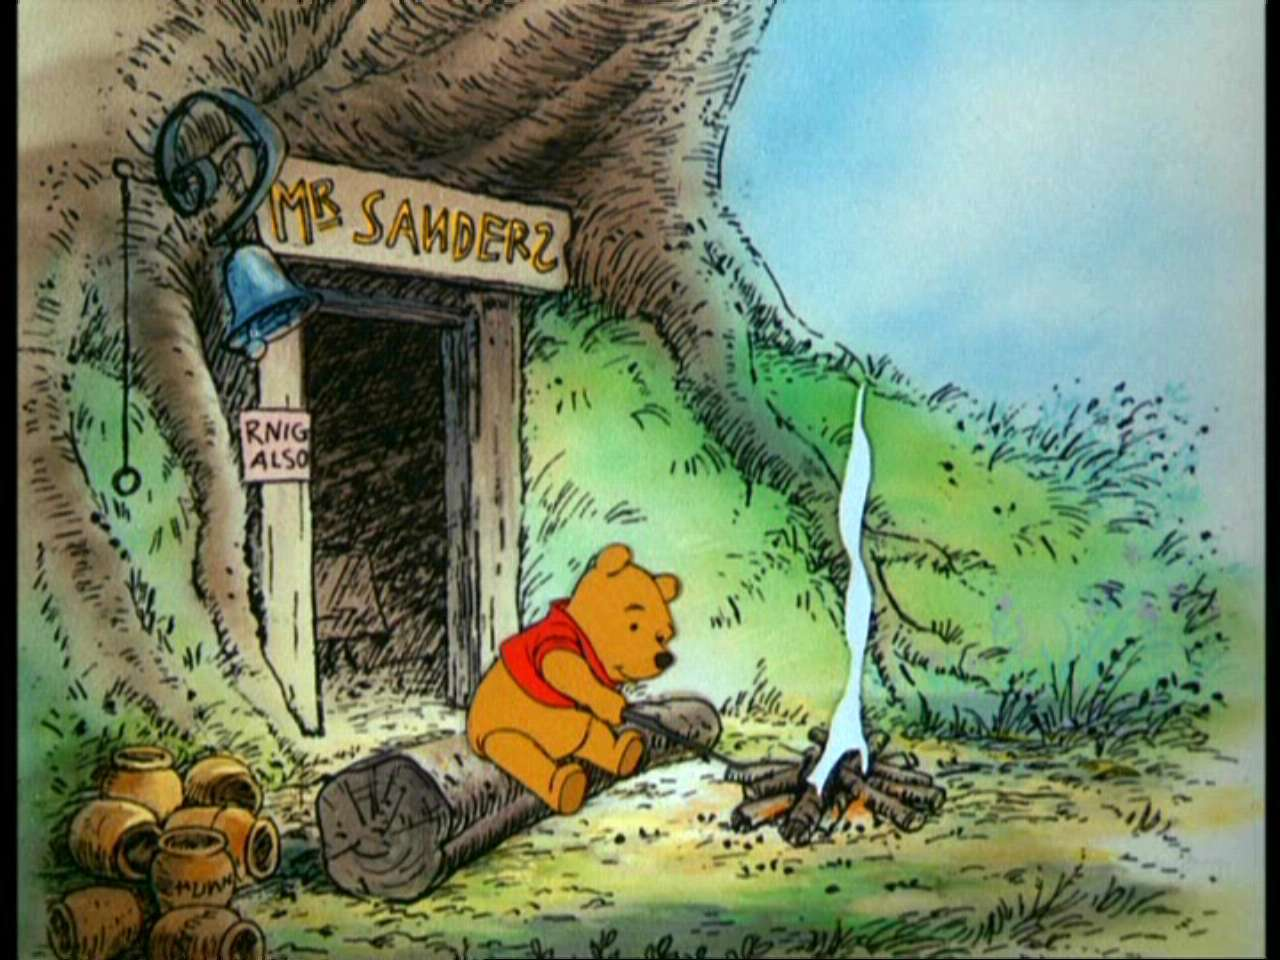 Winnie-the-Pooh-and-the-Hunny-Tree-winnie-the-pooh-2034759-1280-960 ...